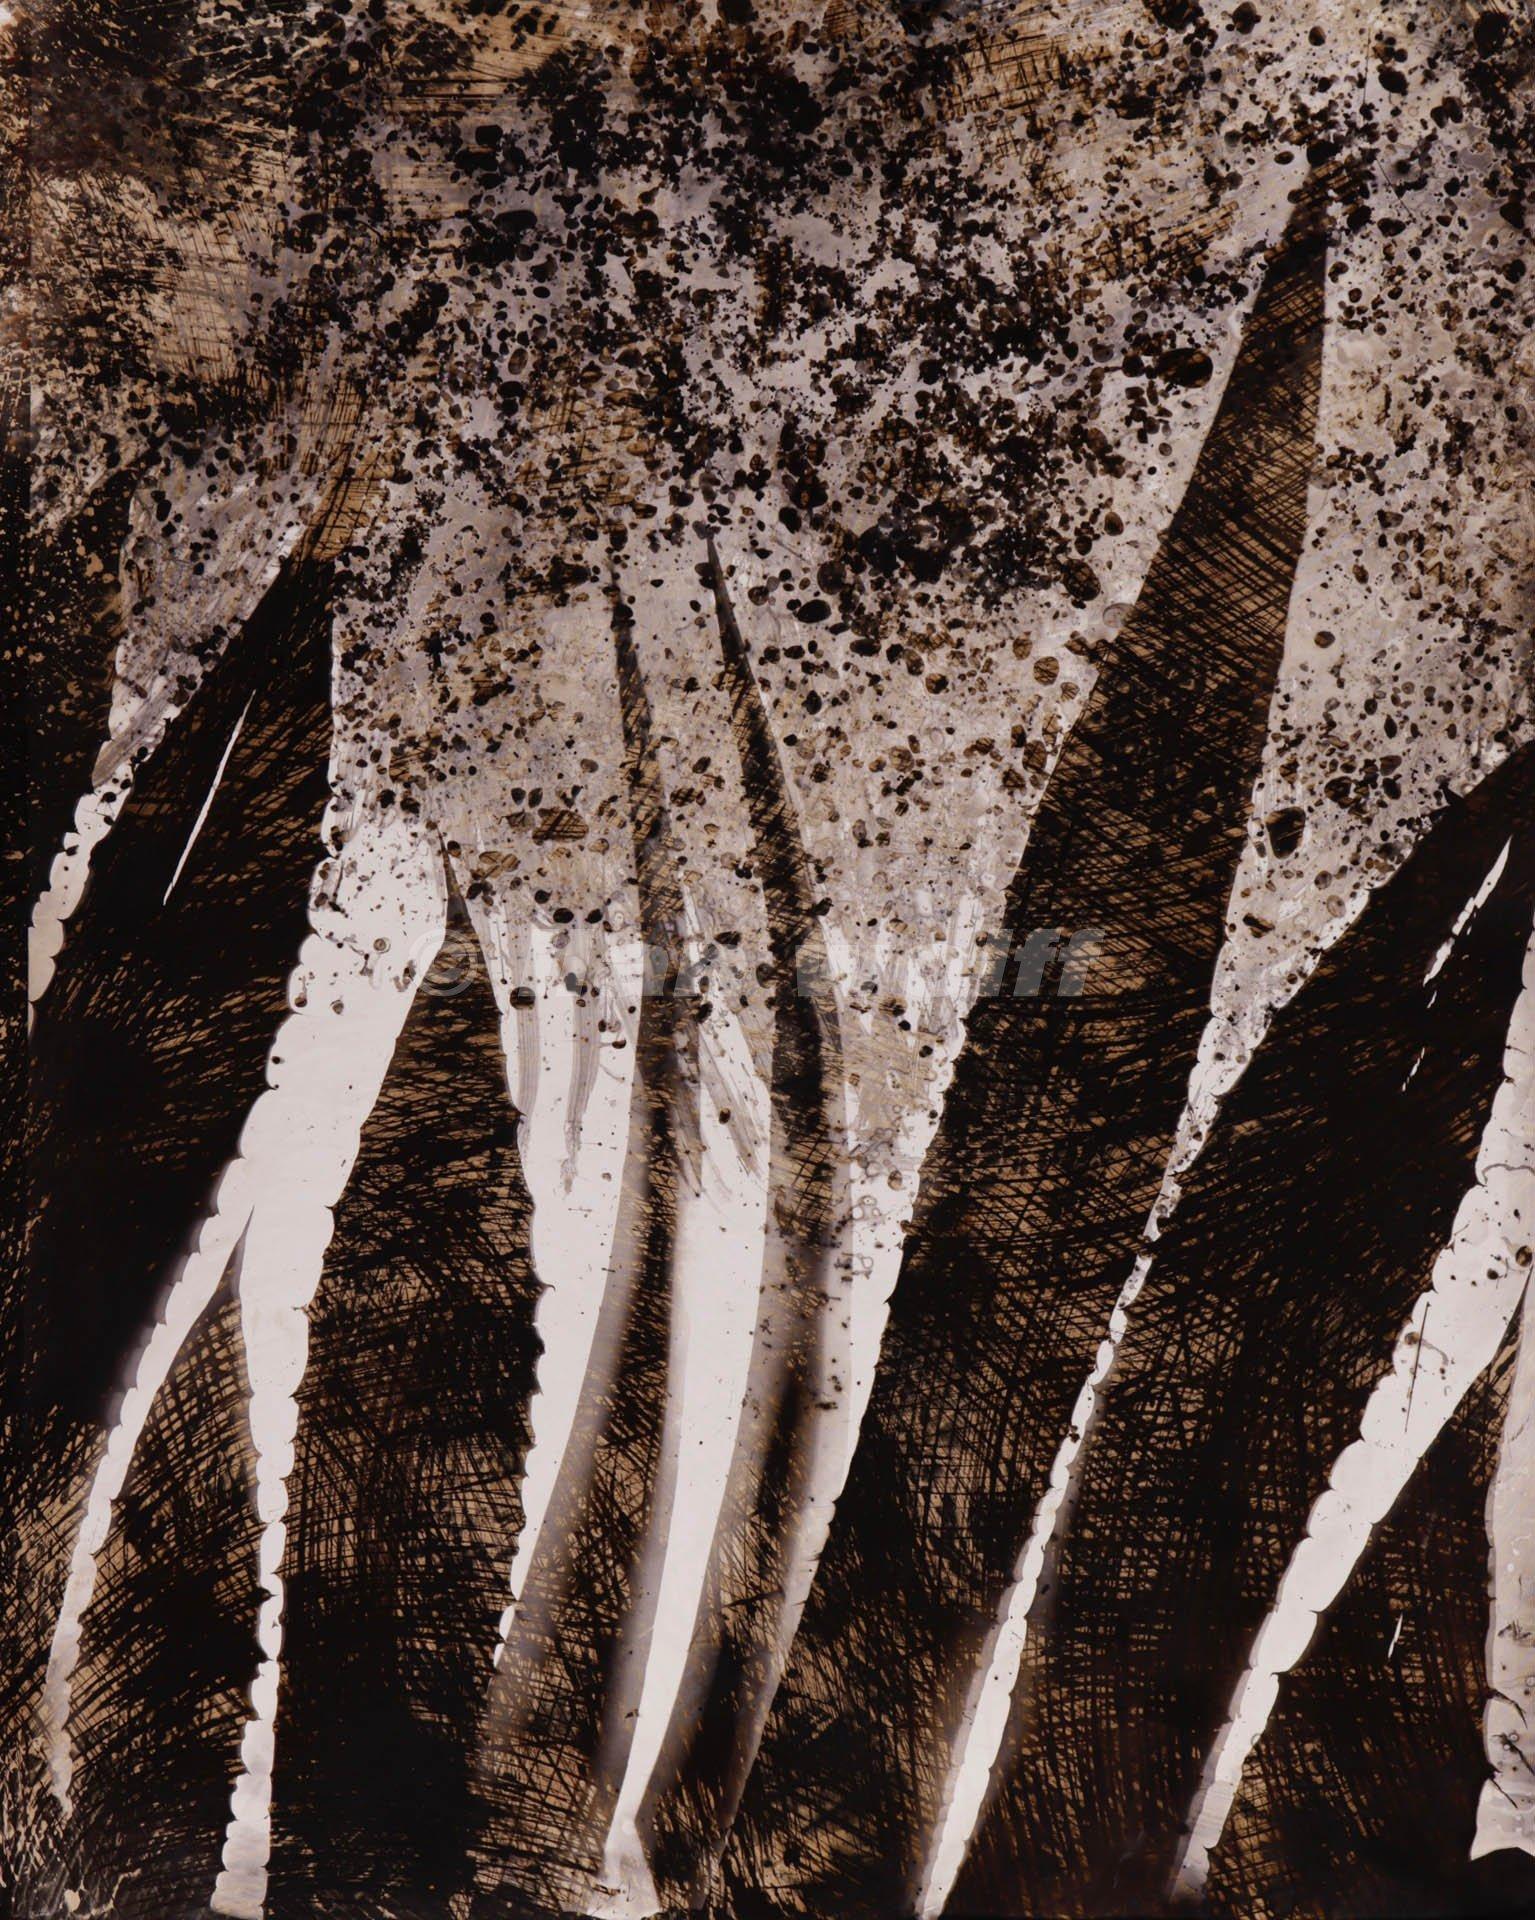 Cactus 2 (2011) - Ilan Wolff